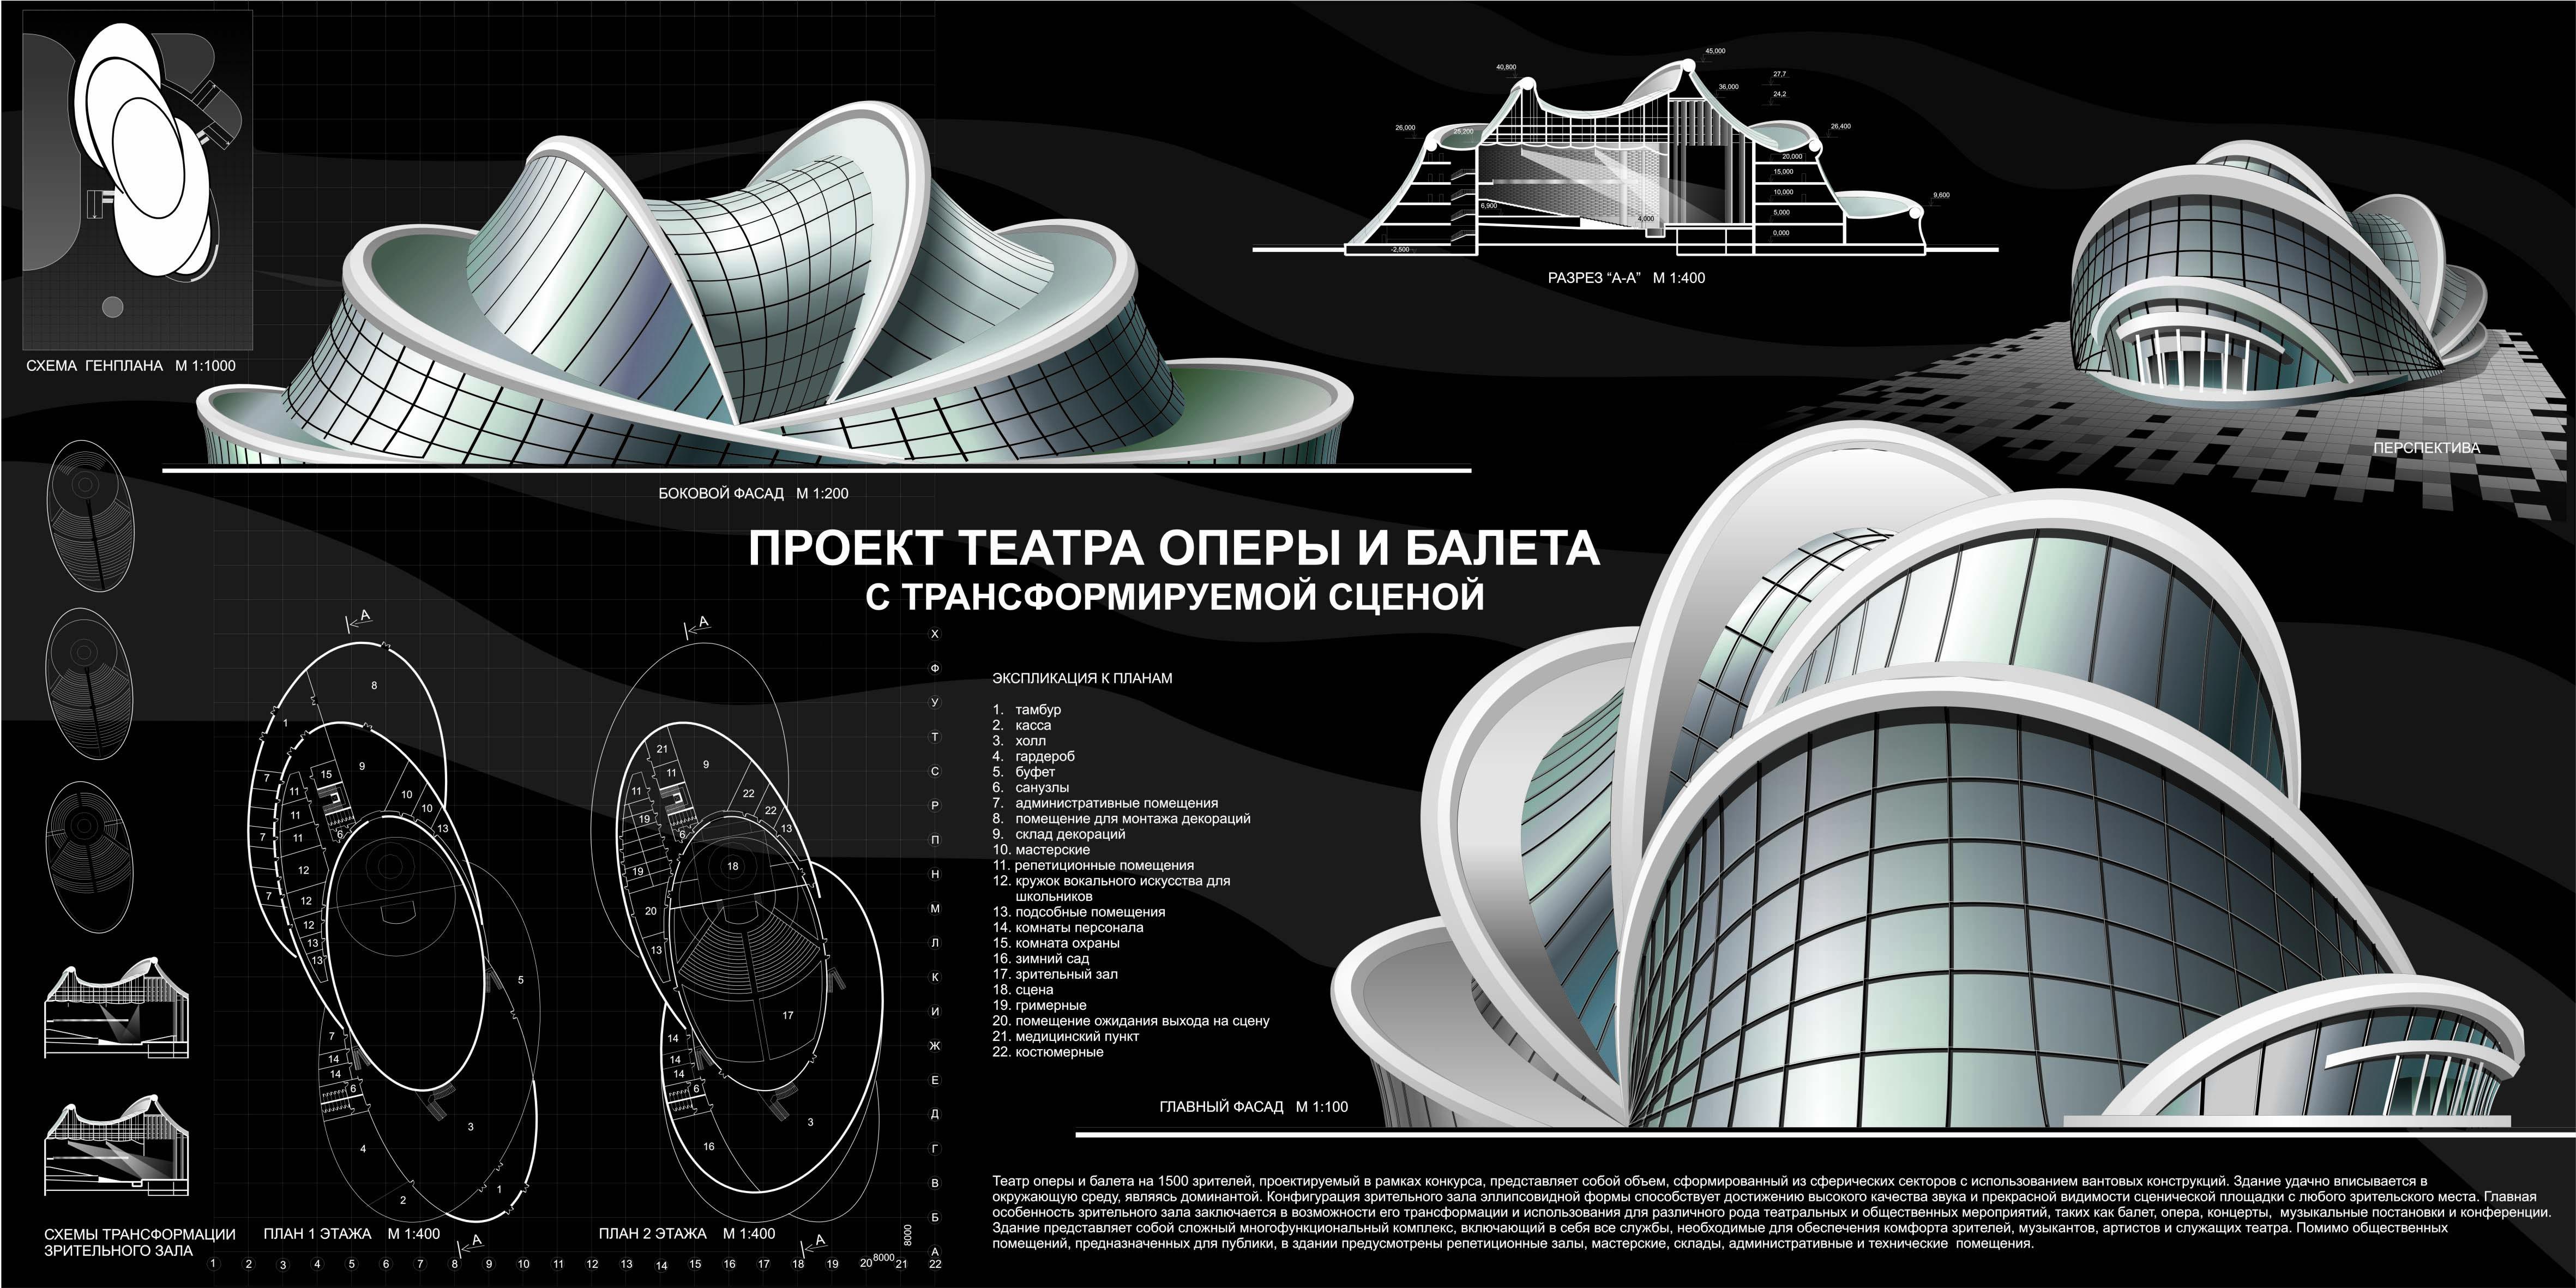 Разработка архитектурной концепции театра оперы и балета фото f_69452f67cafc4921.jpg